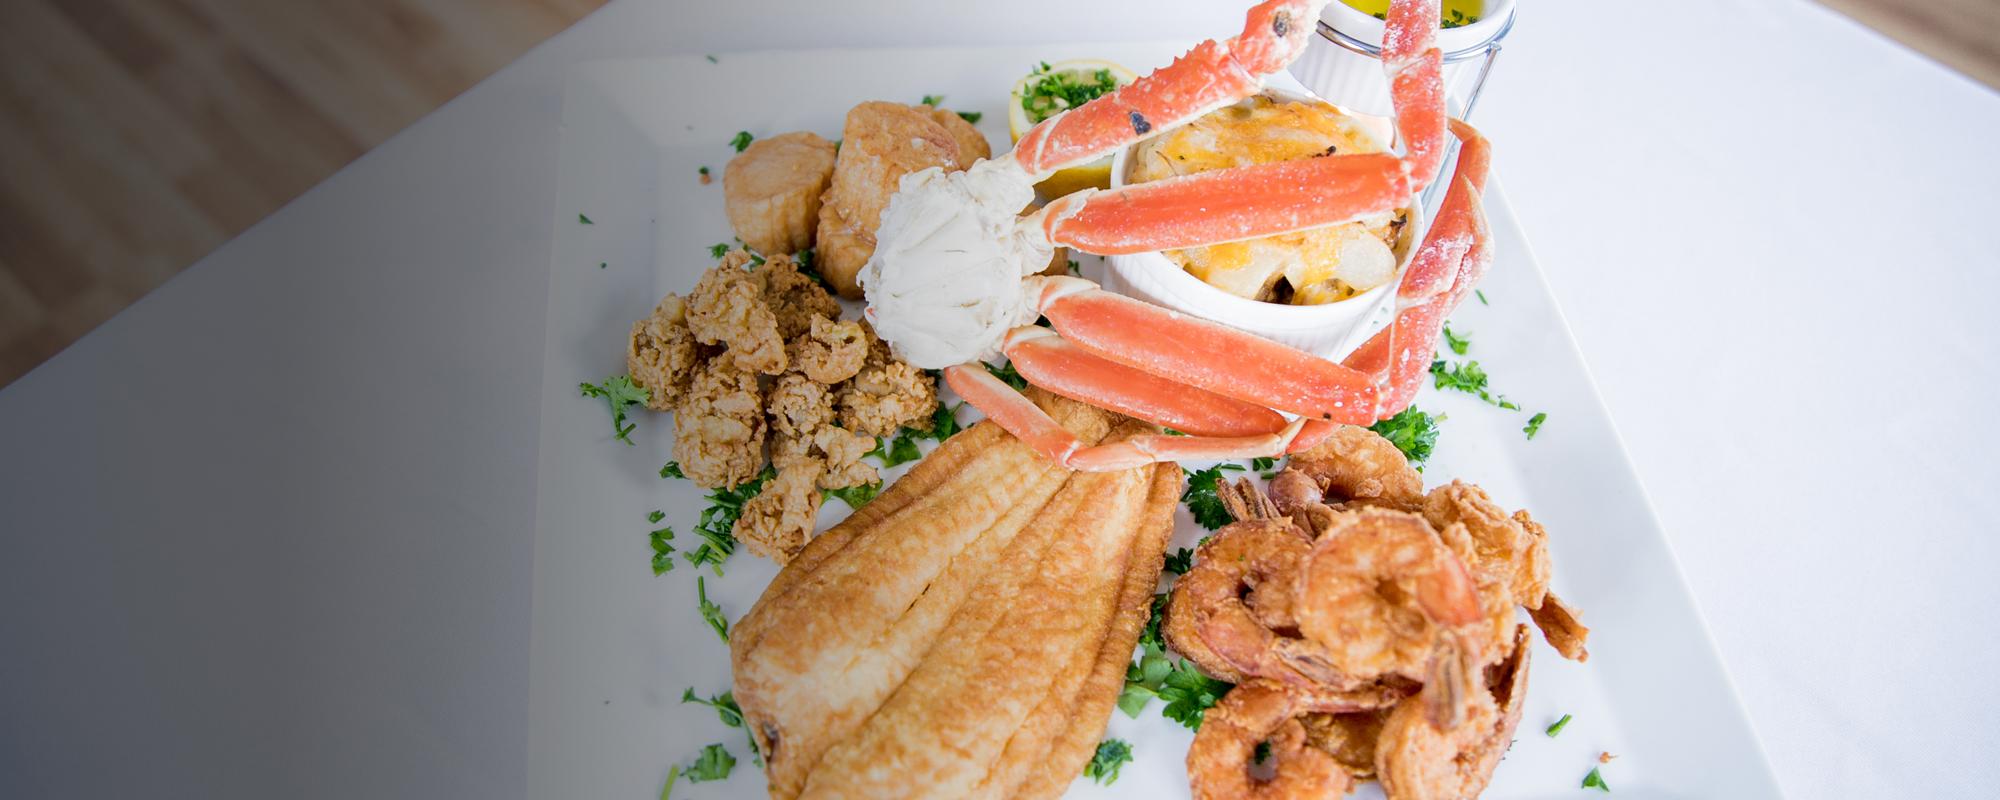 american seafood restaurant in edenton nc